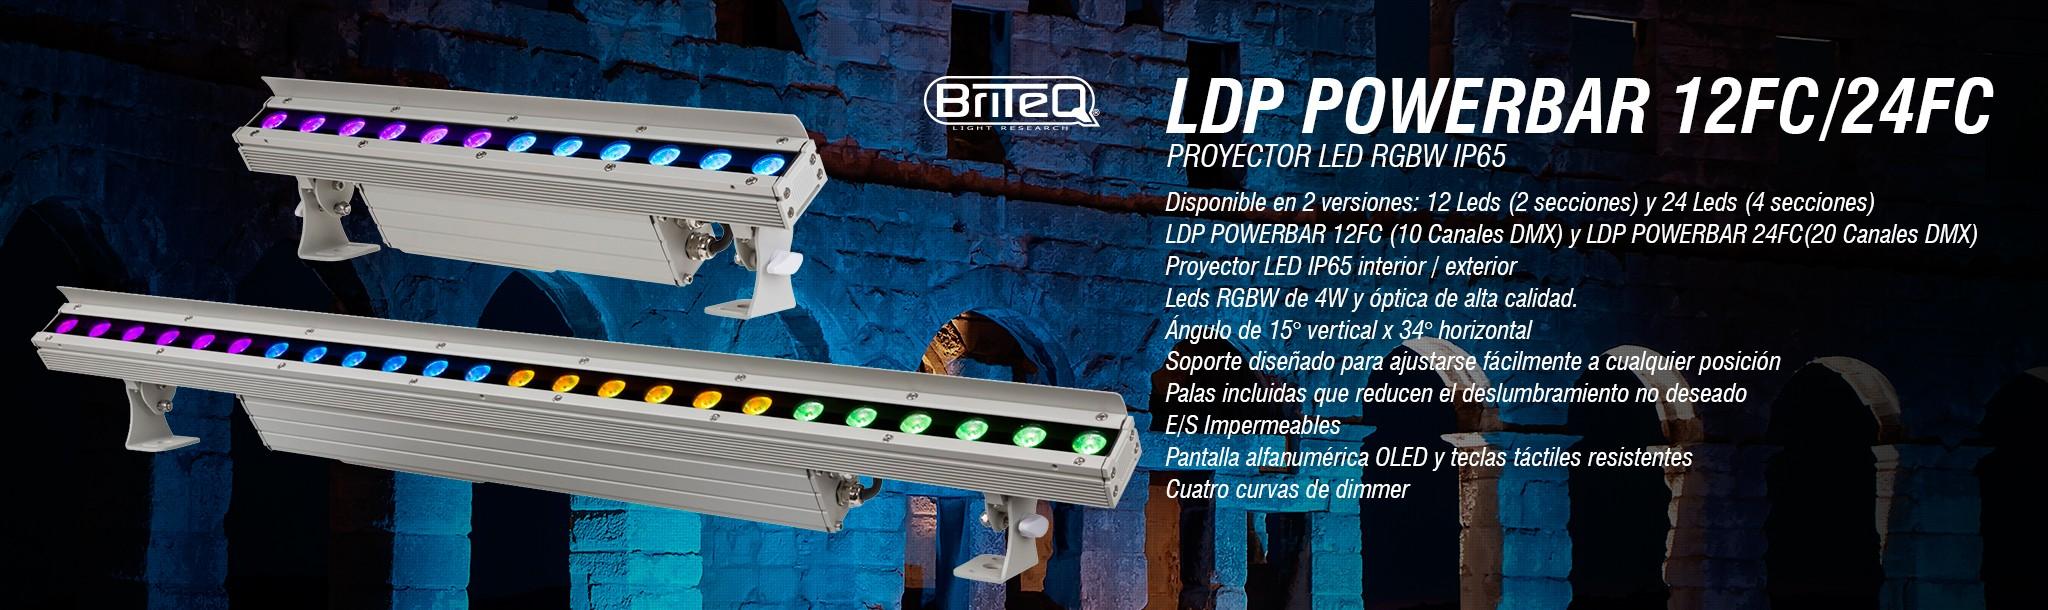 Proyectores LDP POWERBAR